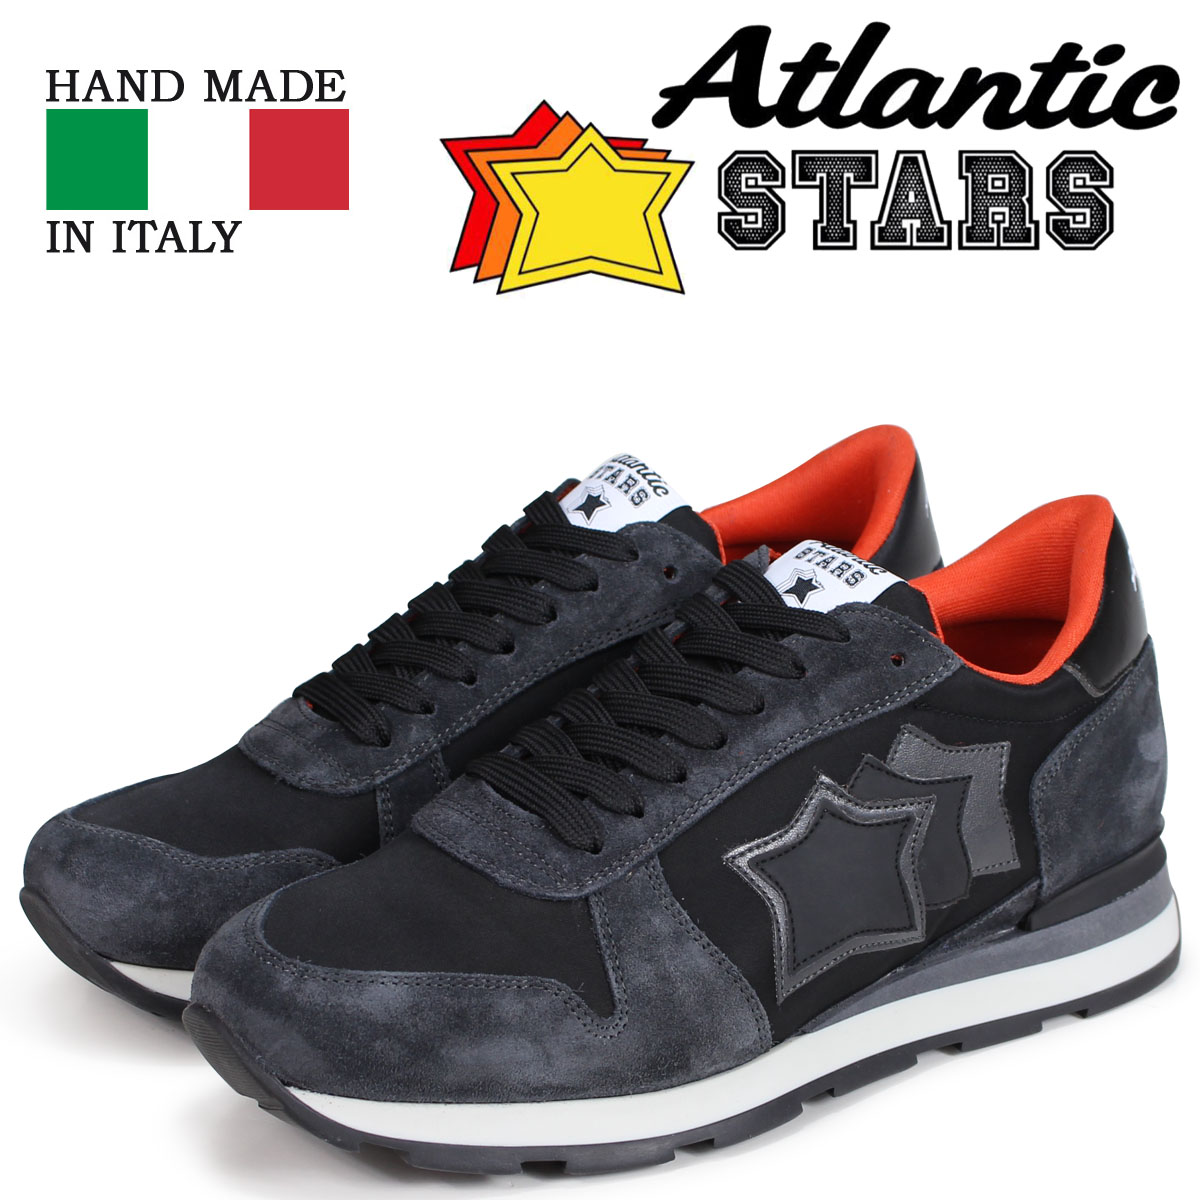 Atlantic STARS メンズ スニーカー アトランティックスターズ シリウス SIRIUS NGA-81N ブラック